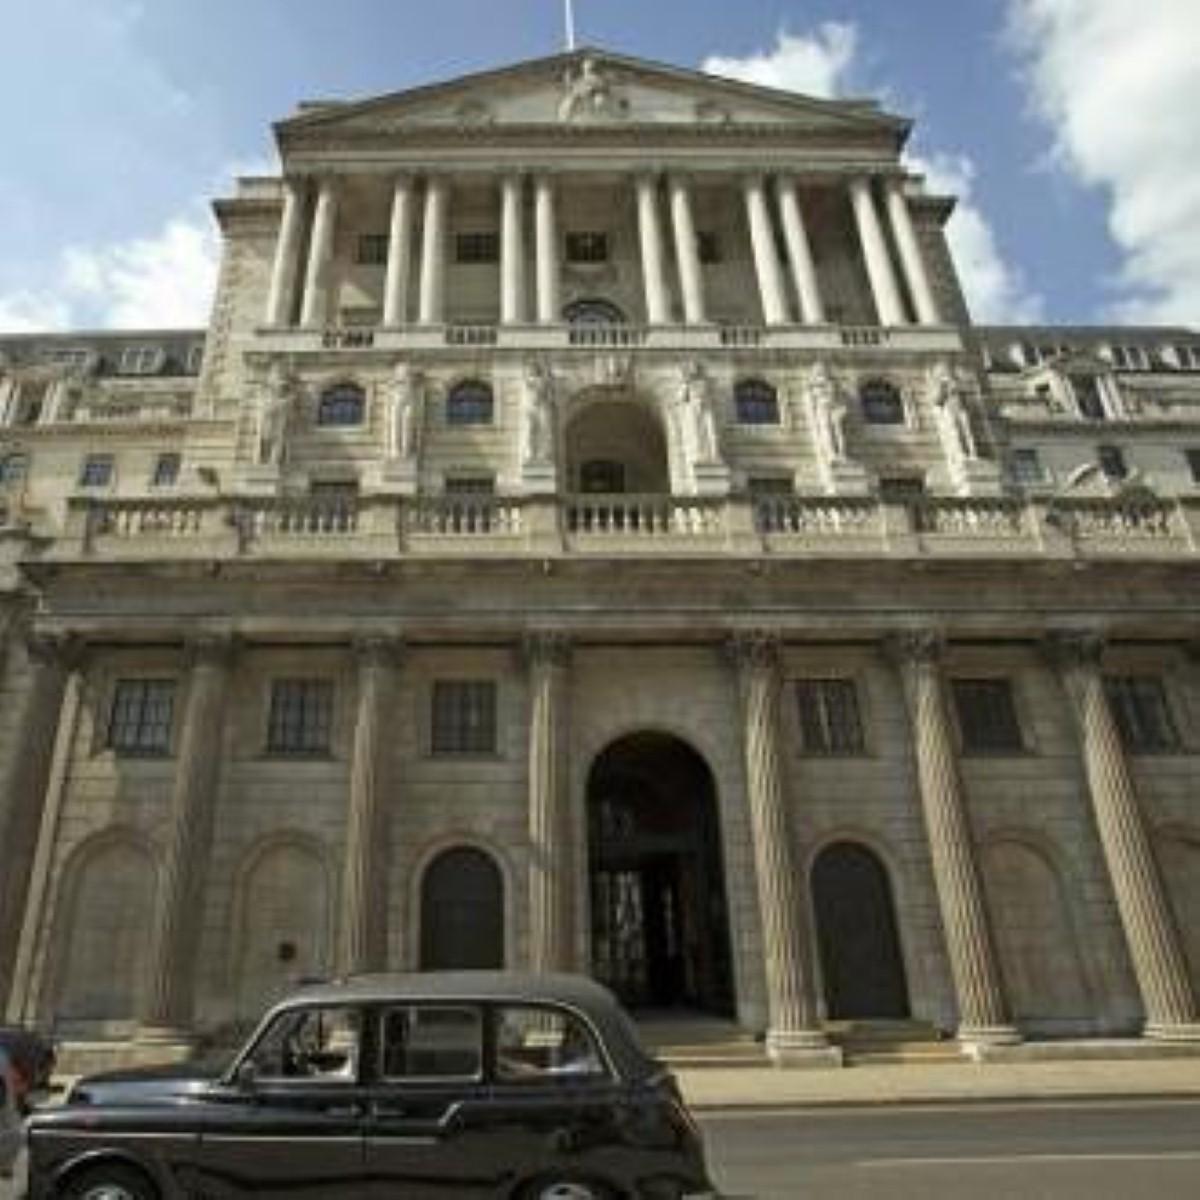 Sir John Gieve admits Bank failed to act